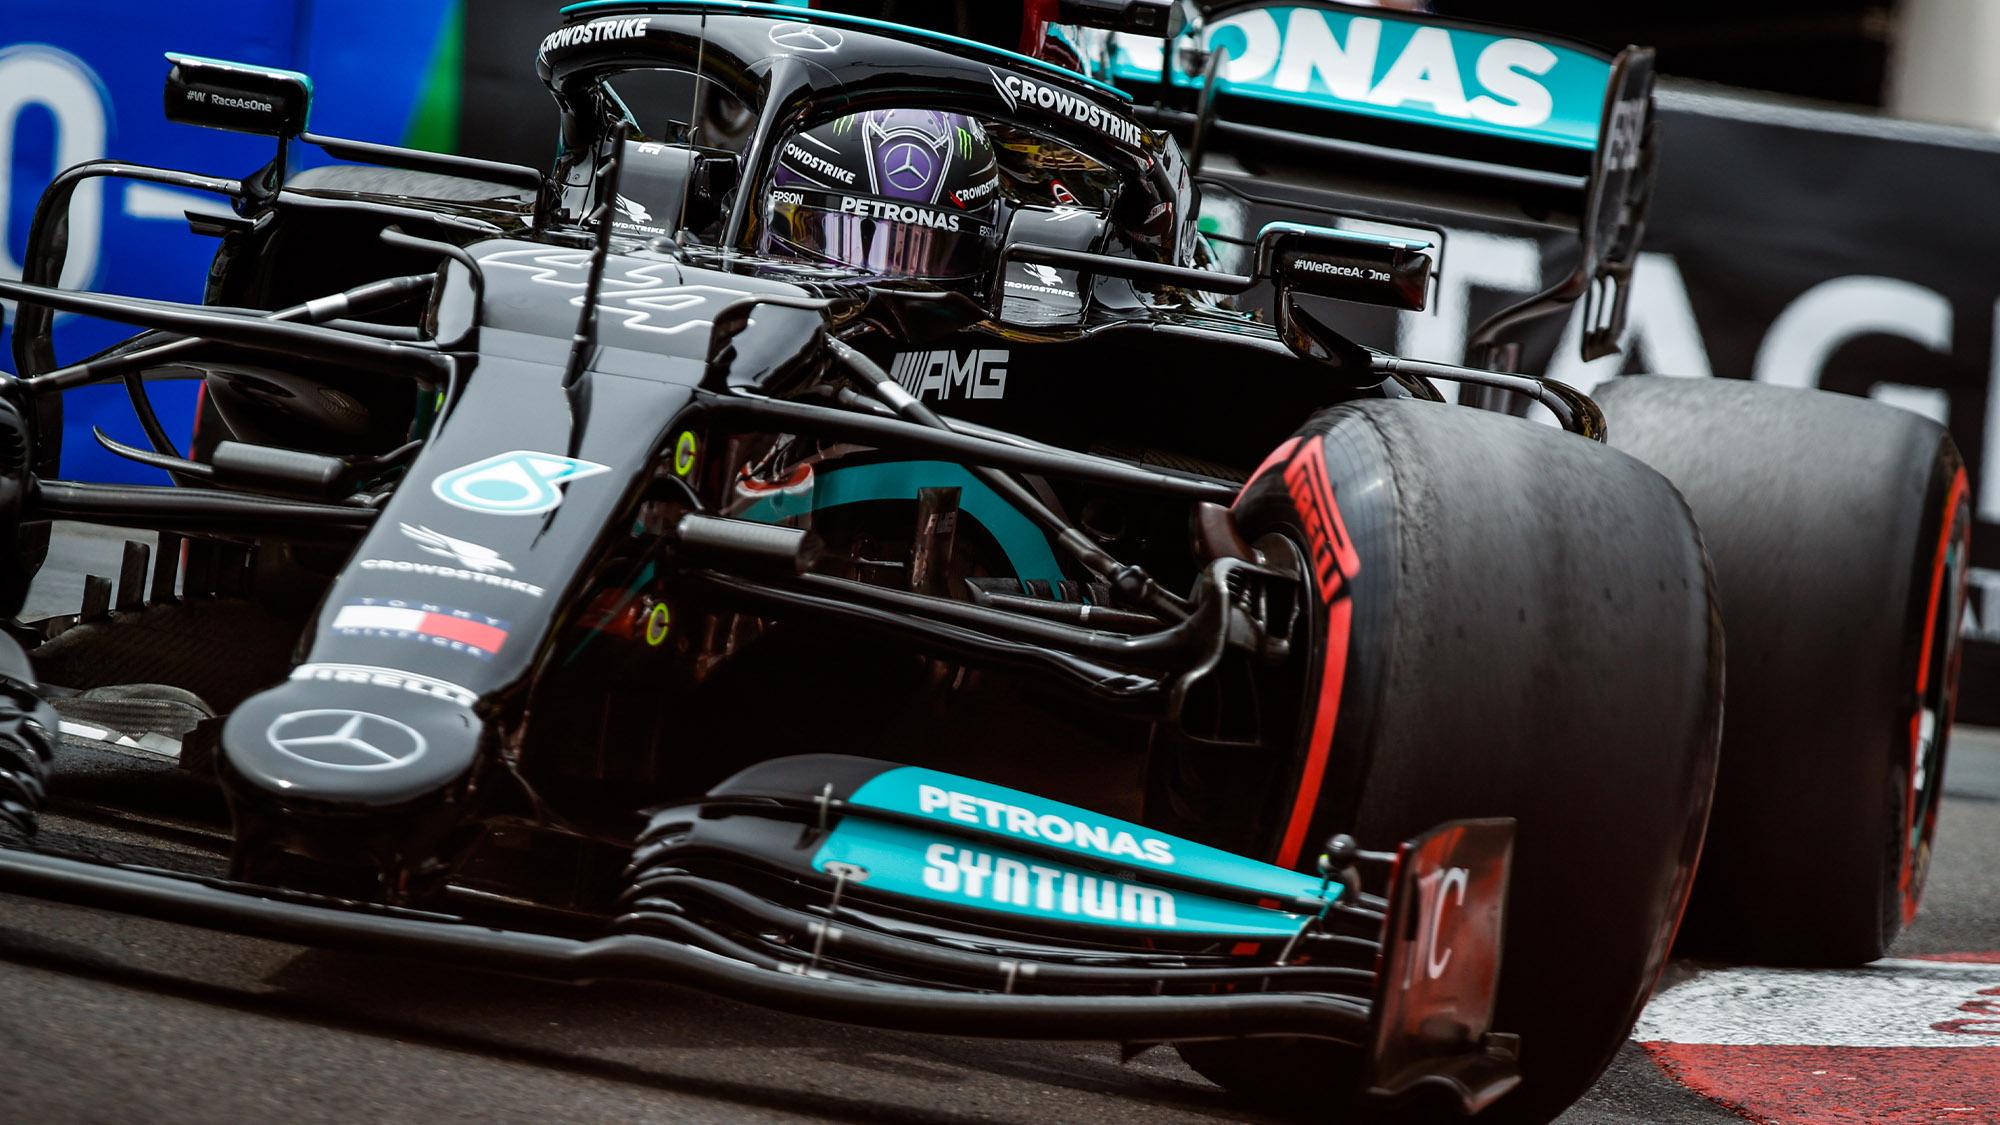 Lewis Hamilton in qualifying for the 2021 Monaco Grand Prix